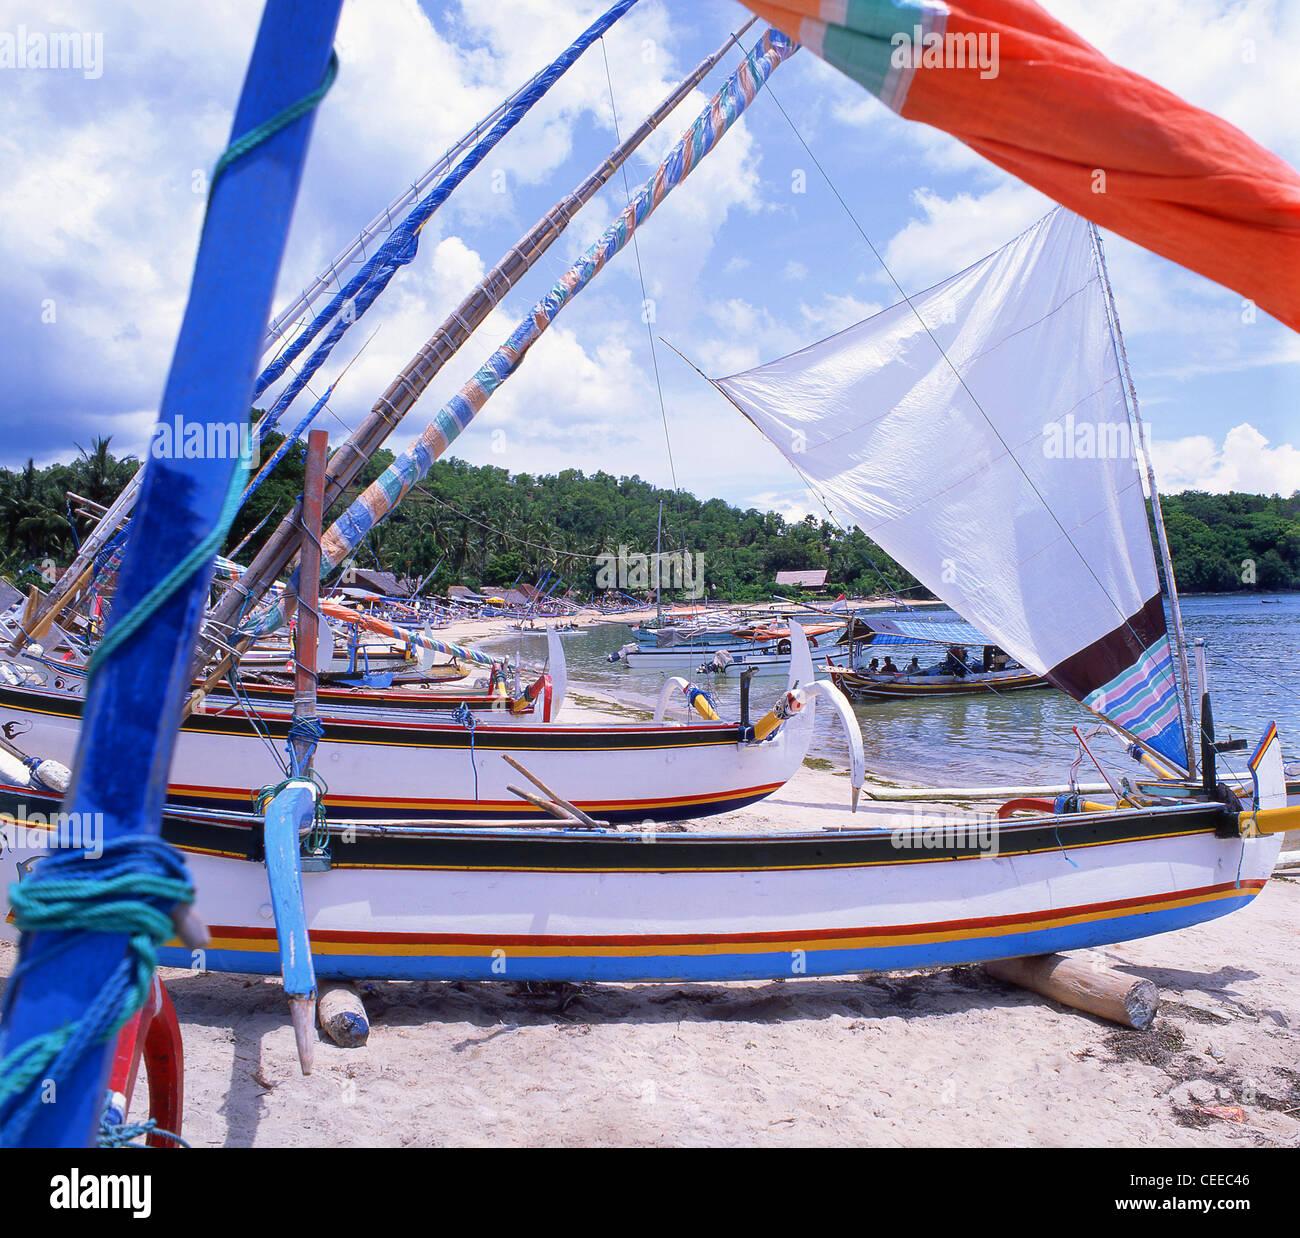 Jukung outrigger sailboats on beach, Padangbai, Bali, Bali Province, Lesser Sunda Islands, Indonesia - Stock Image